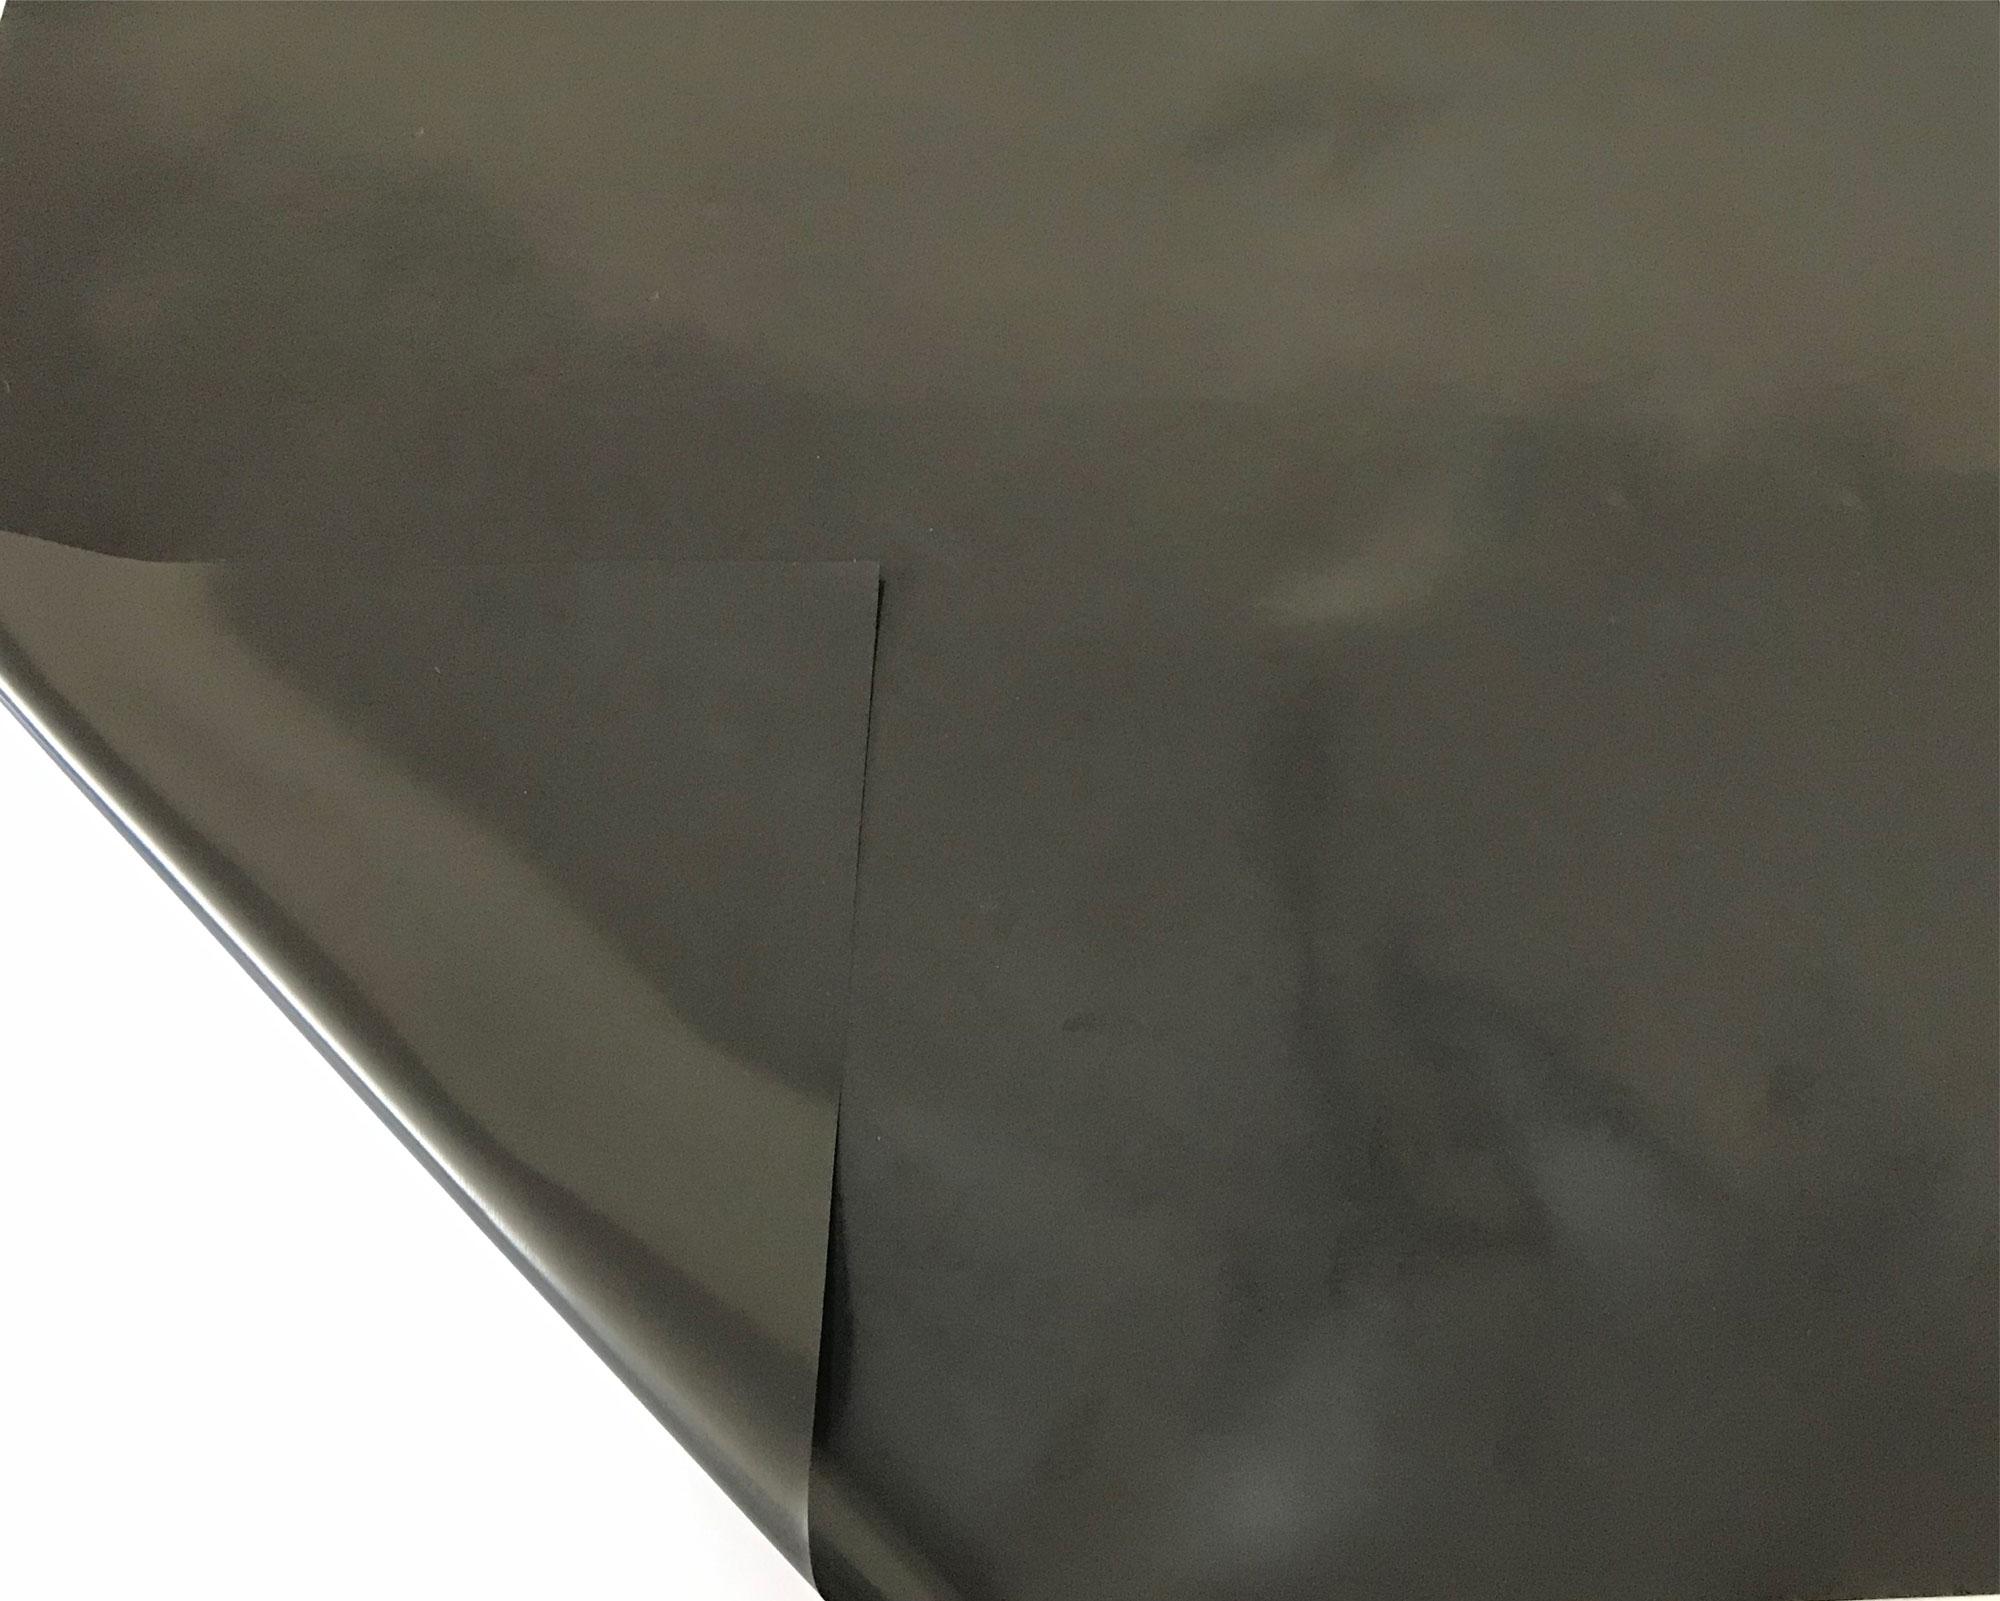 Lona Geomembrana + Manta Bidim 300 Micras - 7x4